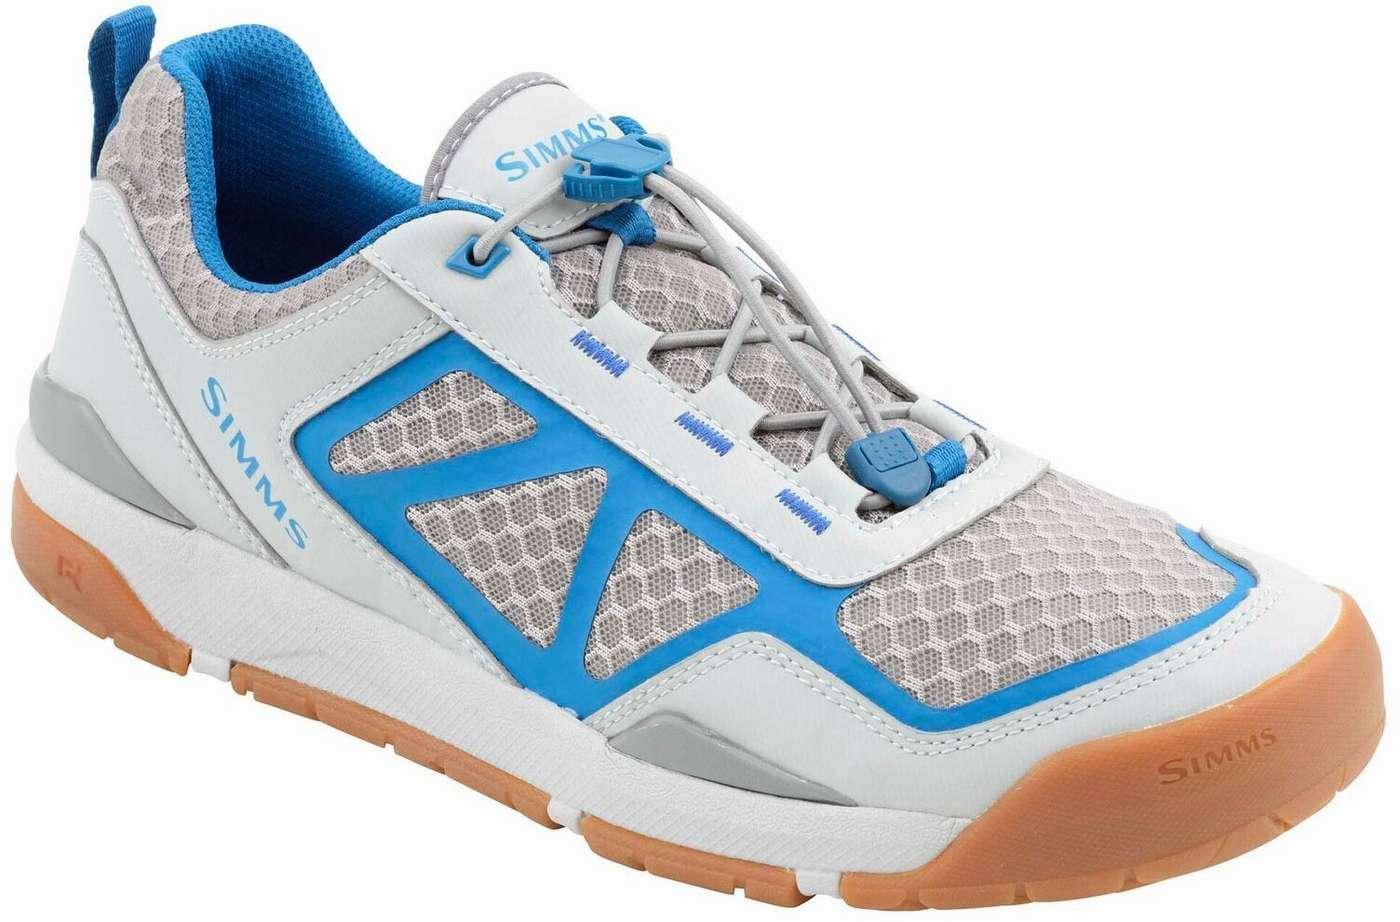 168e467b272d Simms Challenger Boat Shoes